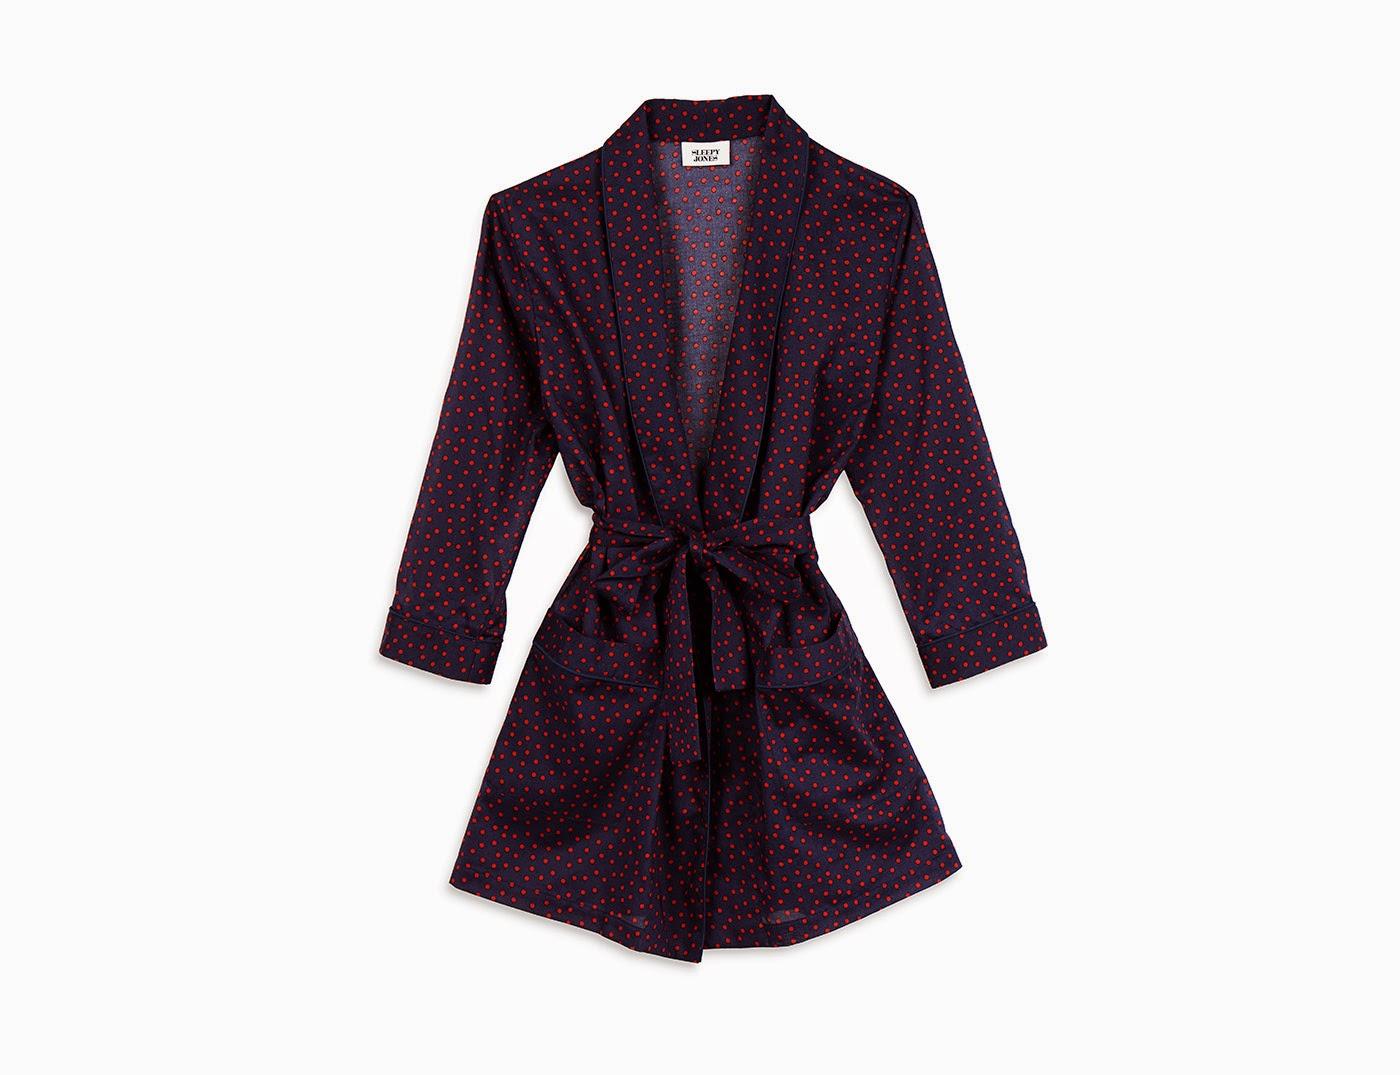 http://sleepyjones.com/women/clothing/products/louise-shrunken-robe-navy-red-dots/navy-red-dots/